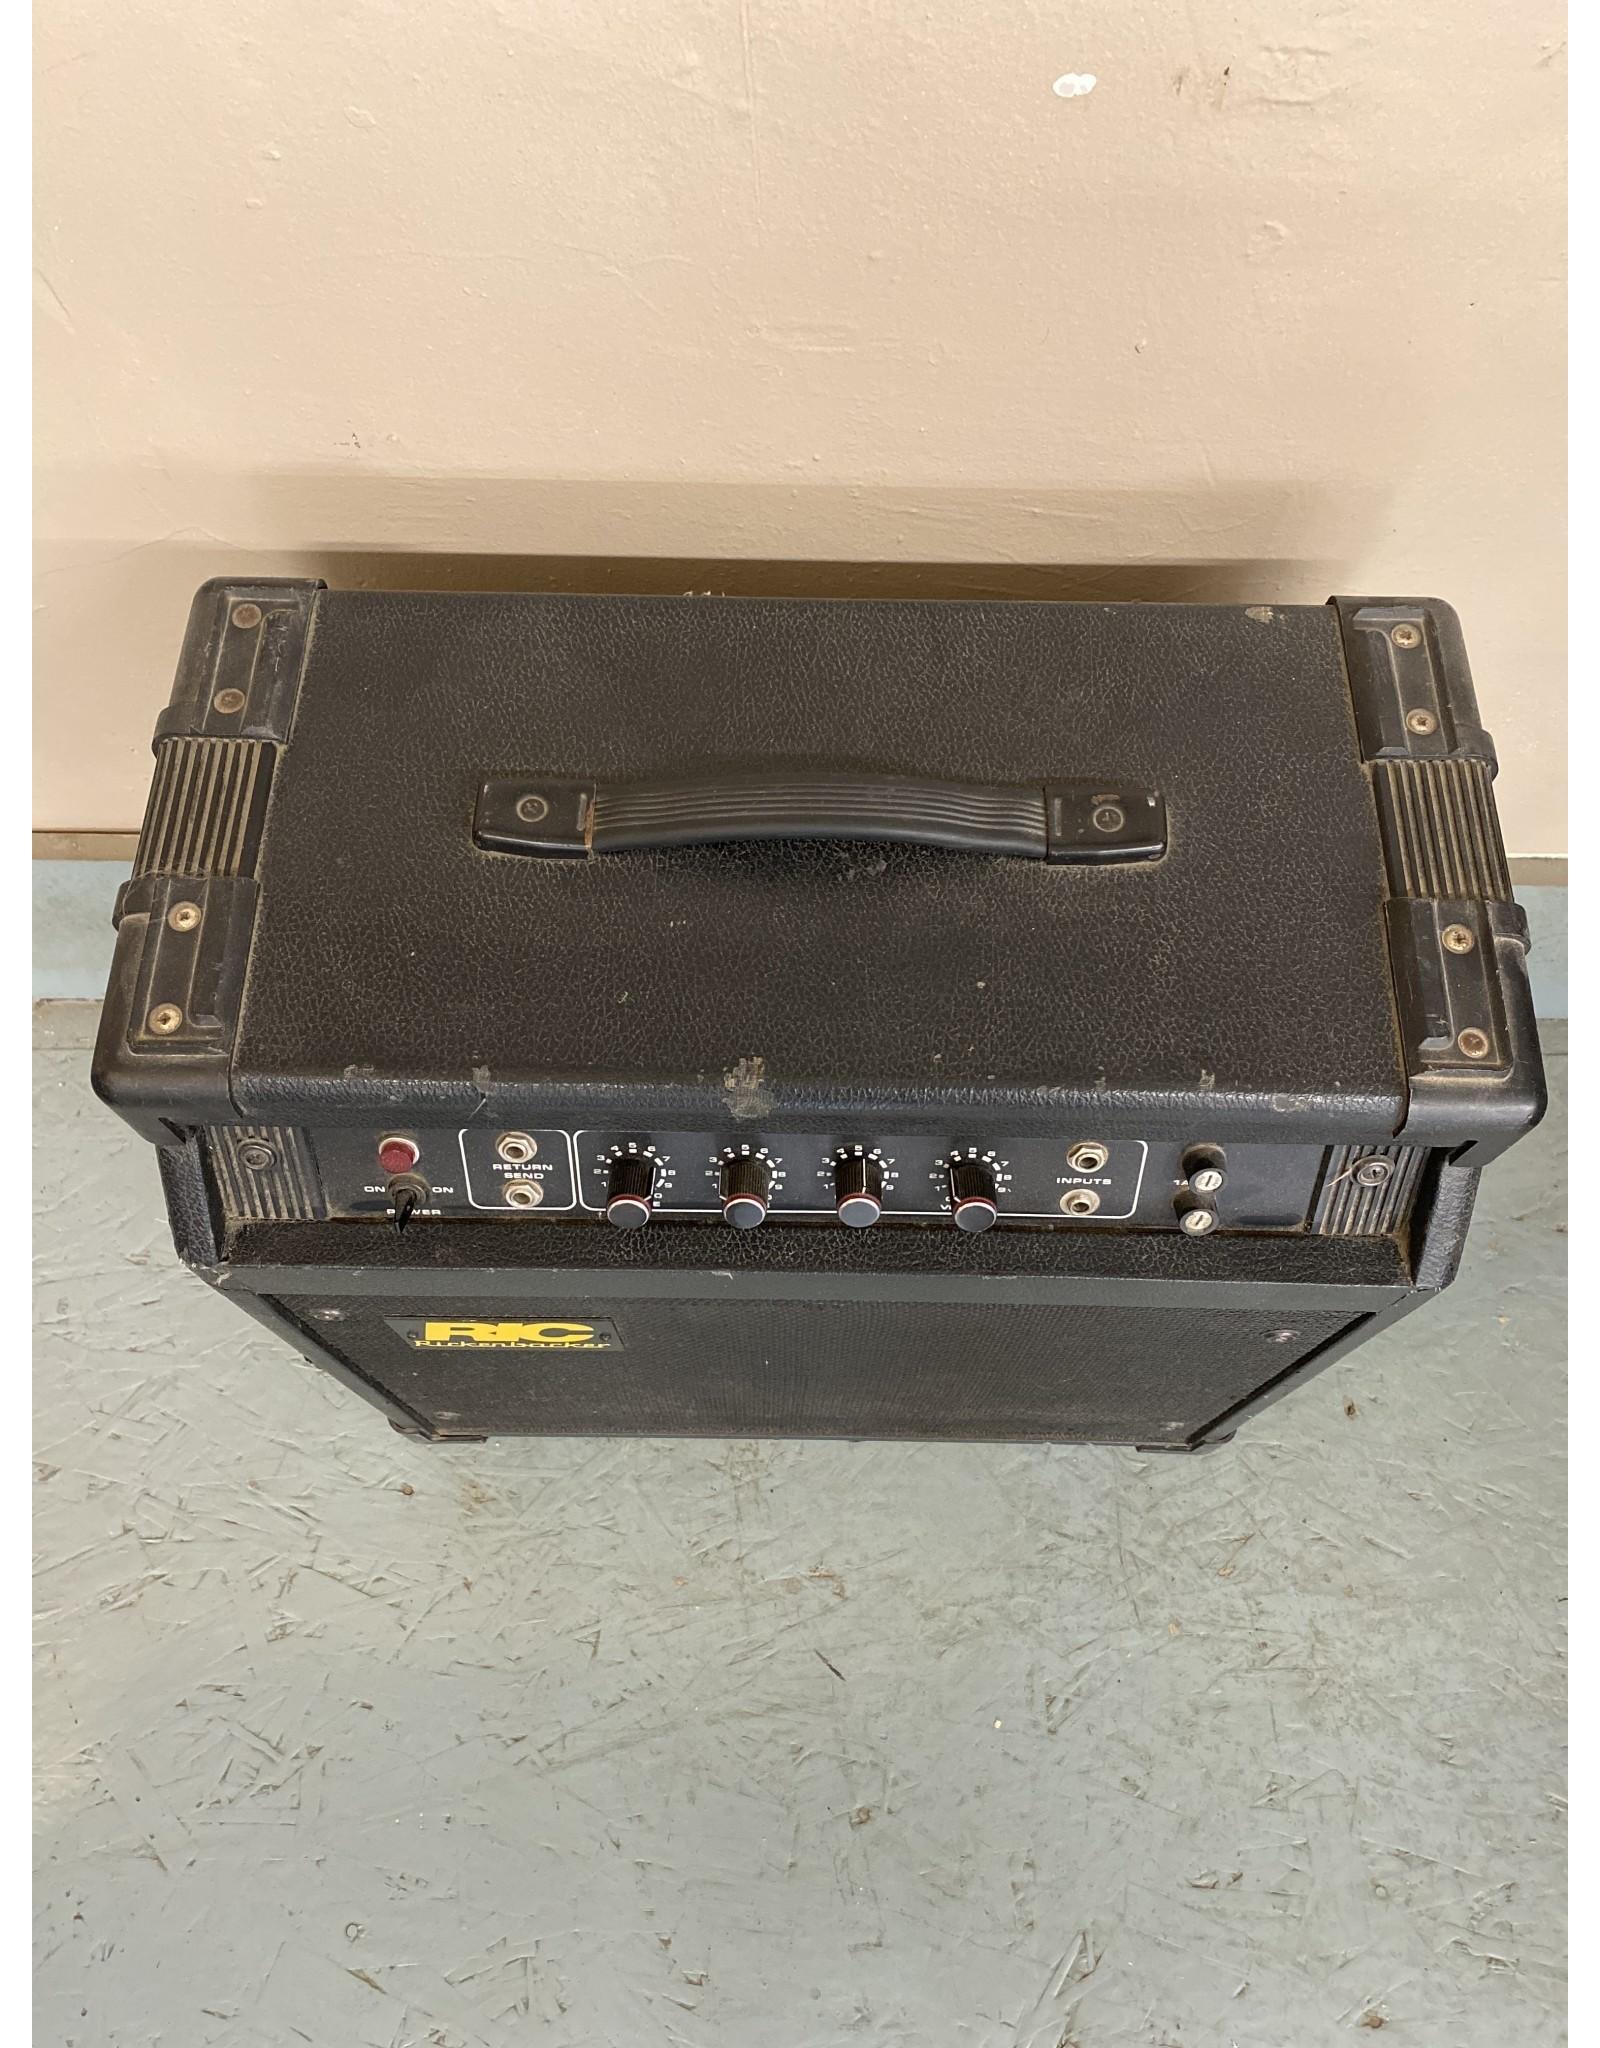 Rickenbacker Rickenbacker RB30 1986 (used)